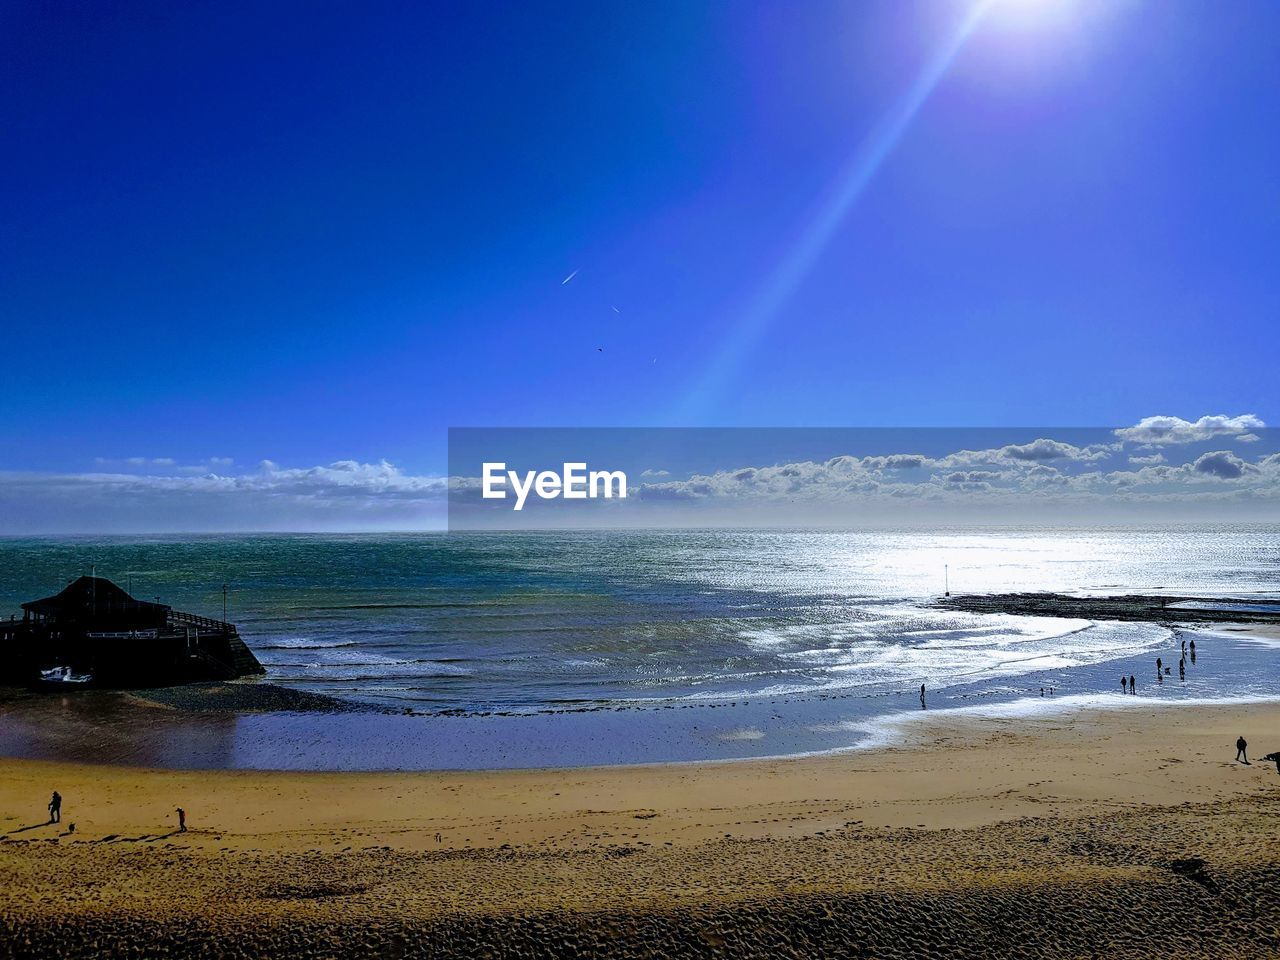 water, sea, sky, beach, land, beauty in nature, scenics - nature, horizon, blue, horizon over water, tranquil scene, tranquility, nature, idyllic, day, non-urban scene, no people, cloud - sky, sunlight, outdoors